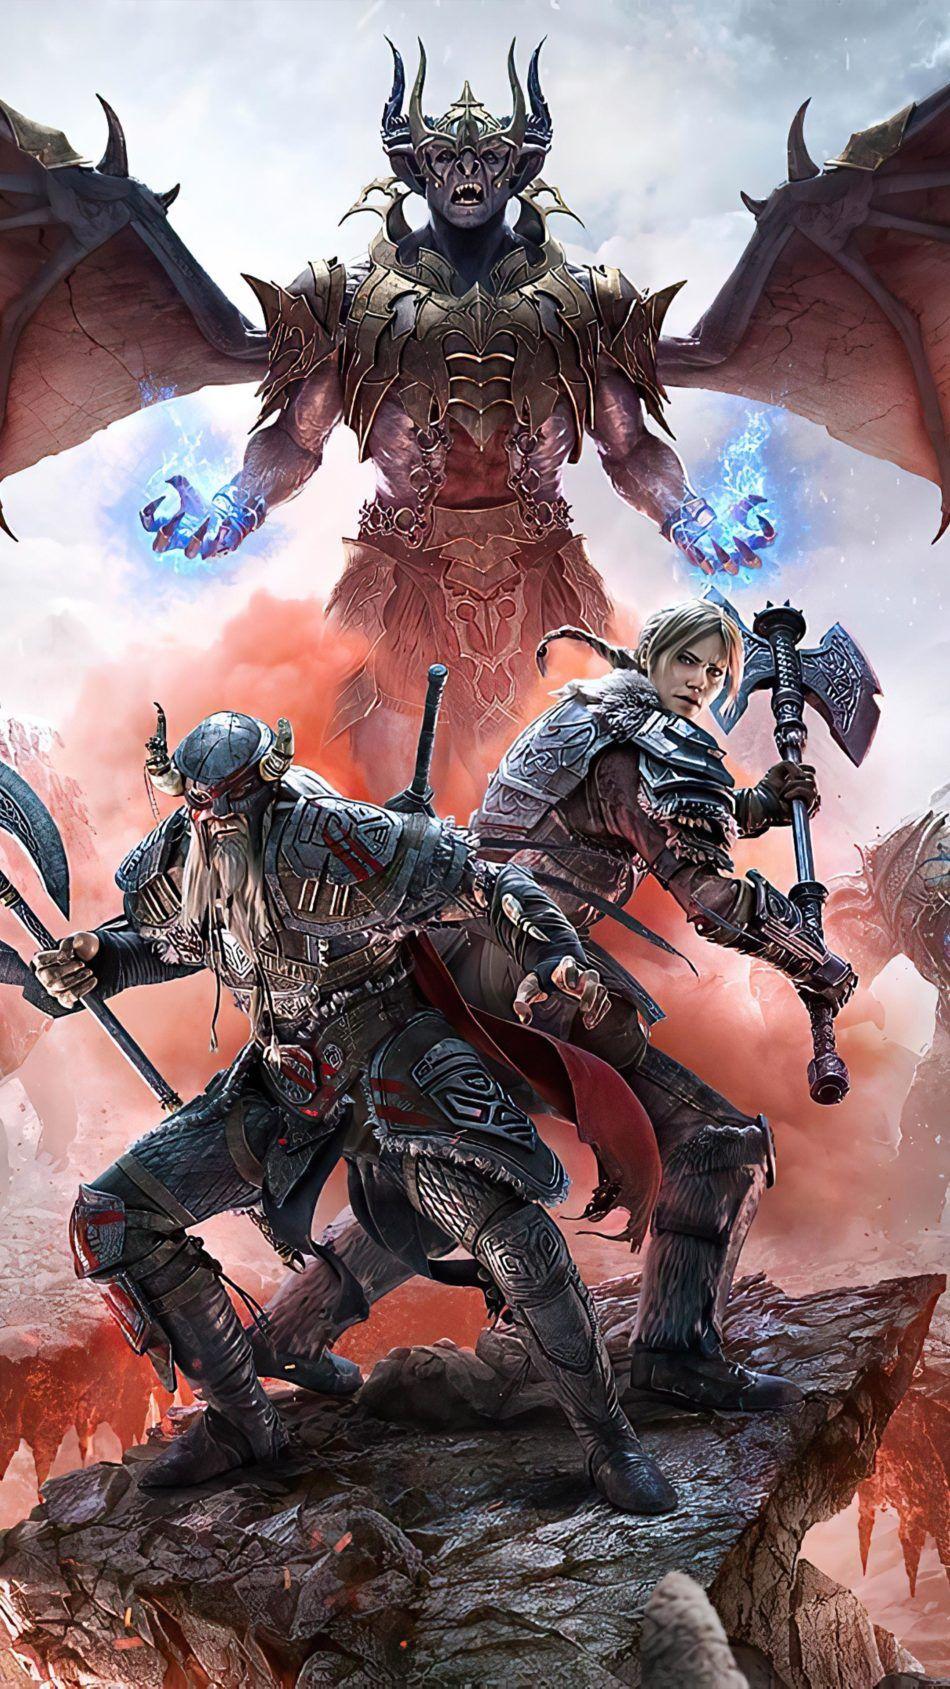 The Elder Scrolls Online Greymoor Poster 4k Ultra Hd Mobile Wallpaper Elder Scrolls Elder Scrolls Skyrim Elder Scrolls Art